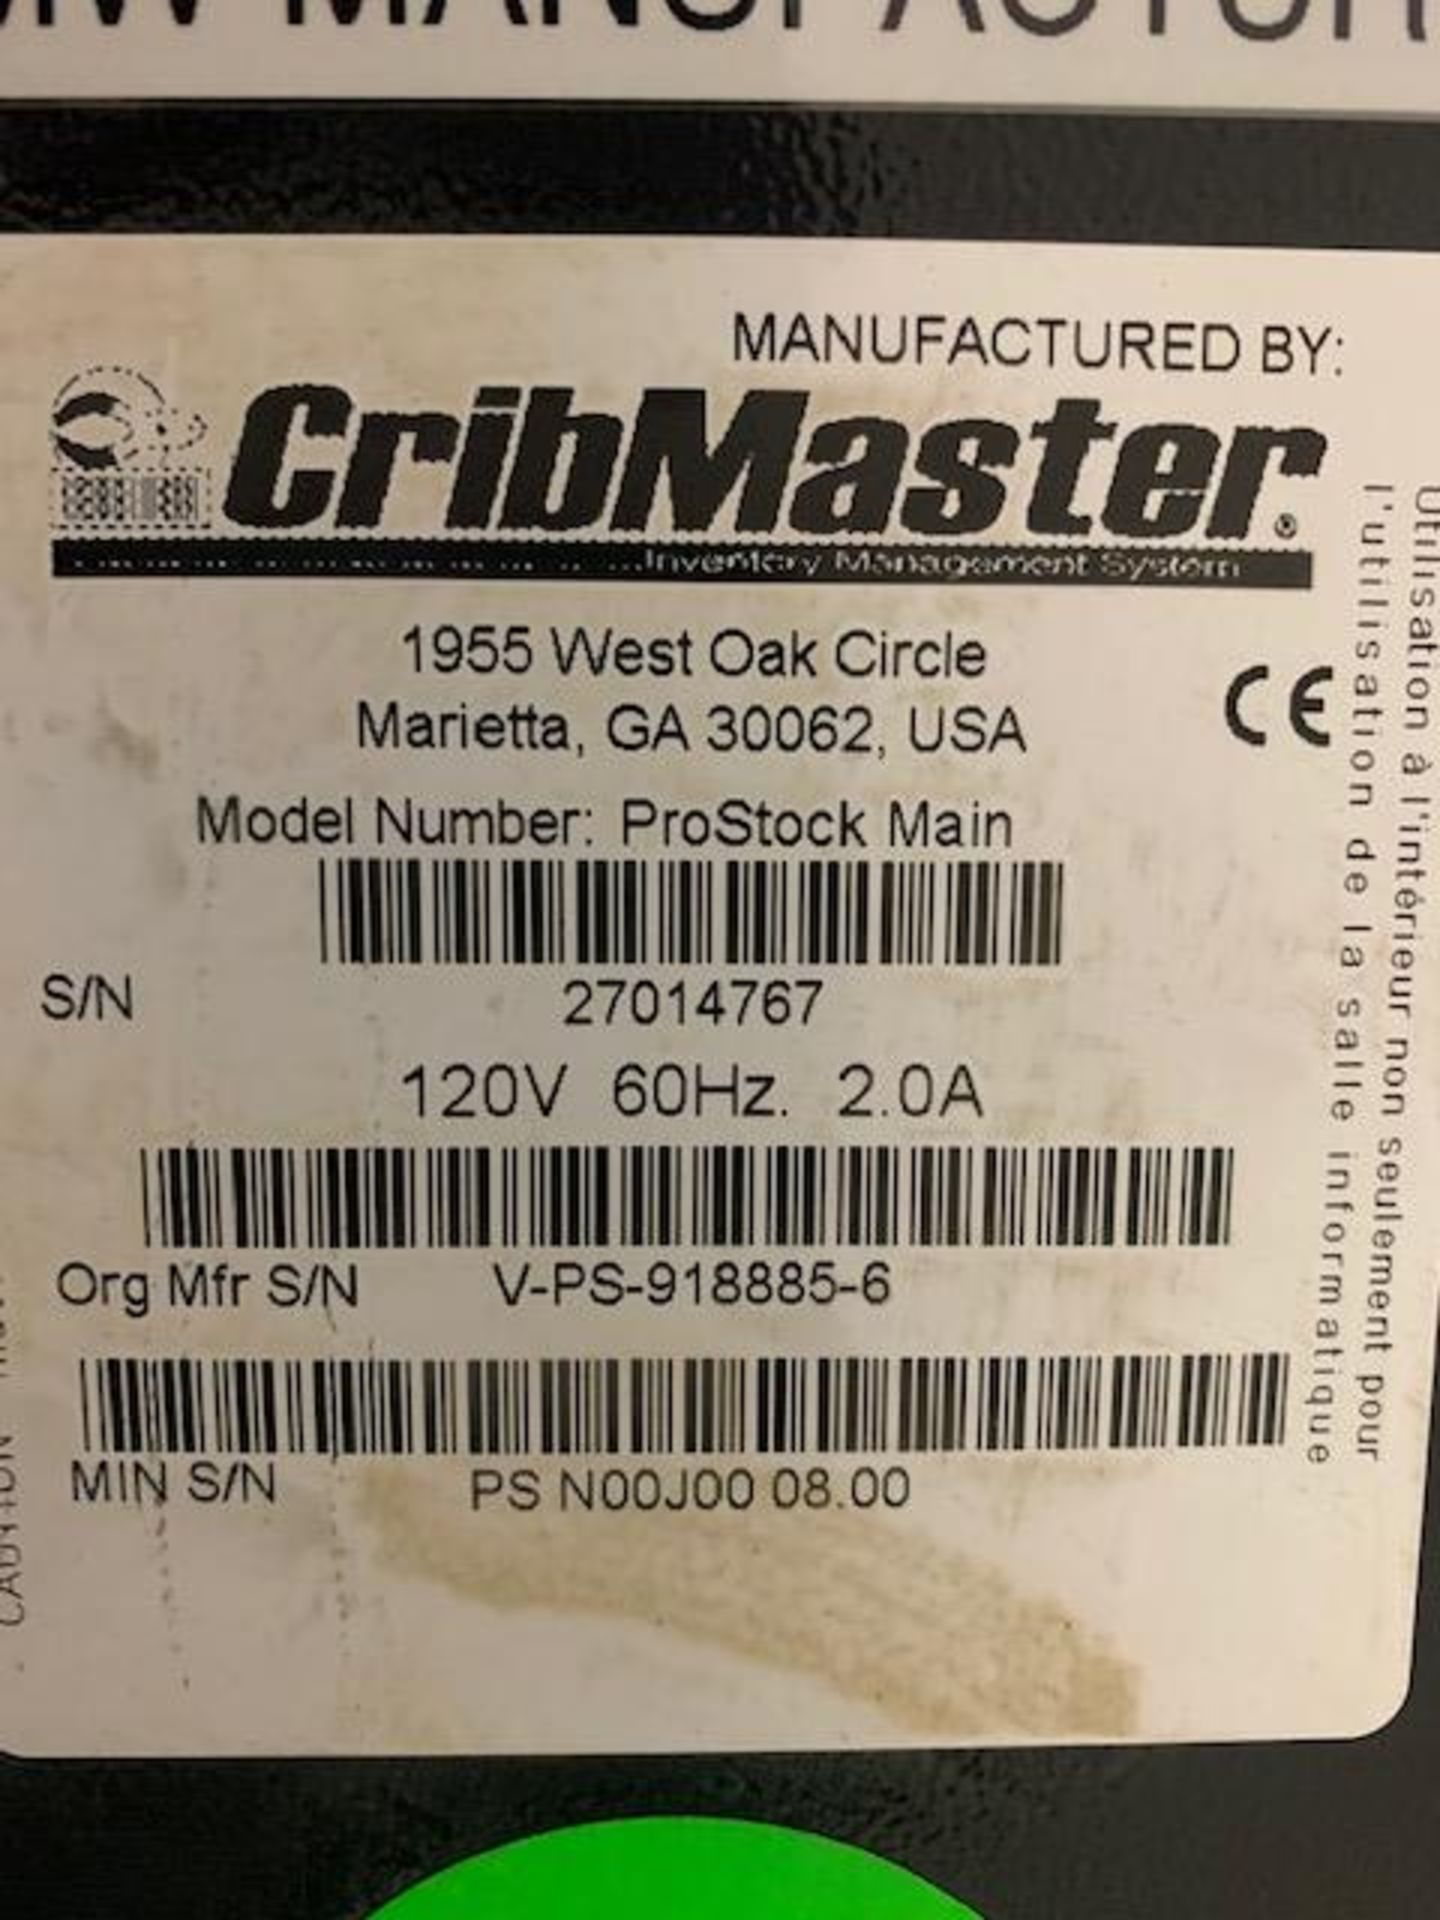 Cribmaster ProStock - Image 12 of 12